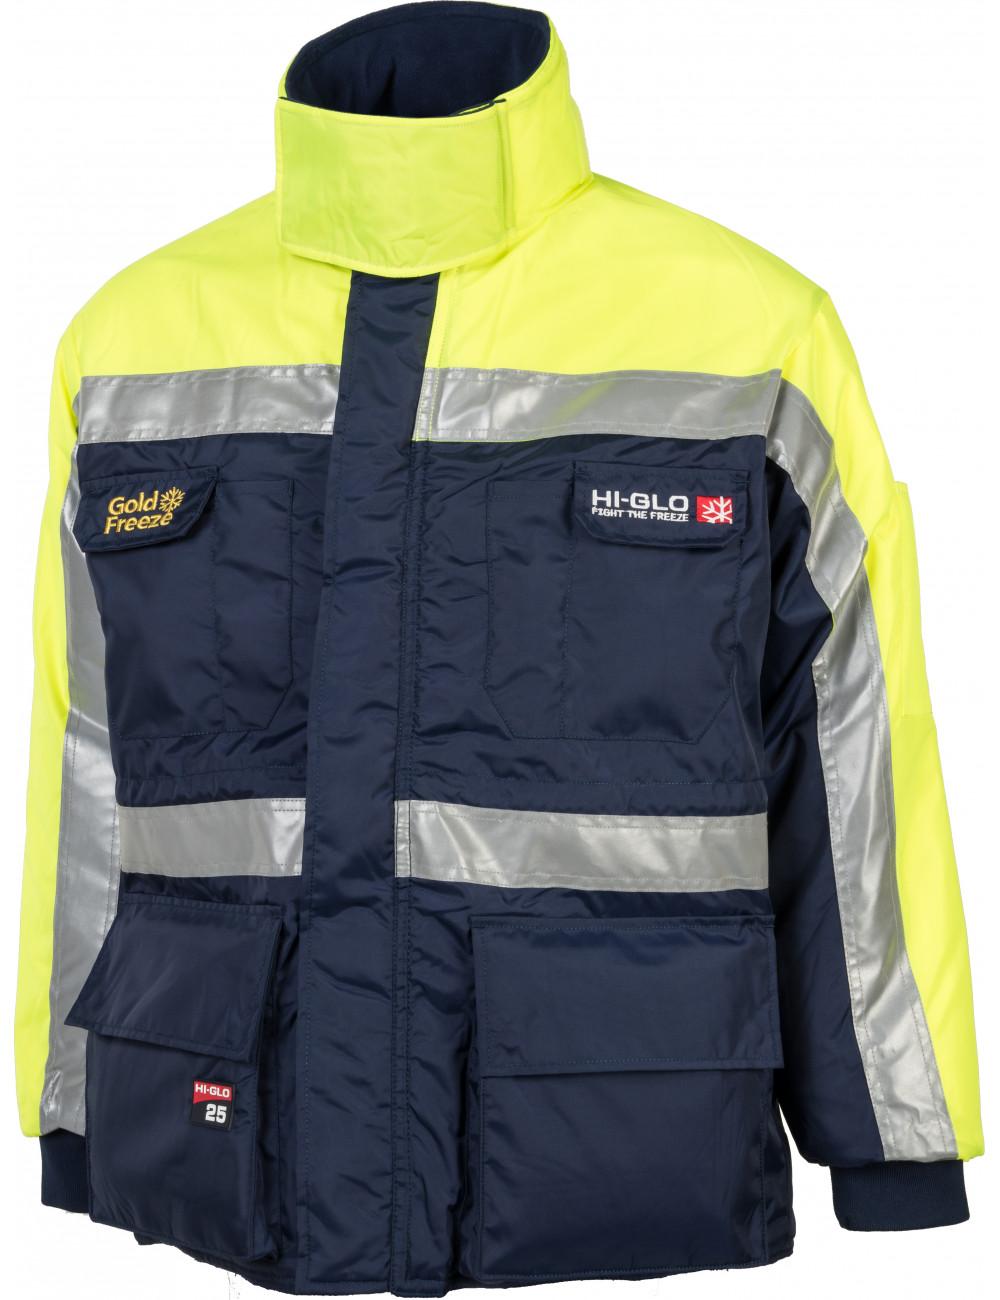 Kurtka do mroźni lub chłodni Hi-Glo 25 Coldstore Jacket OCHRONA DO -64,2°C